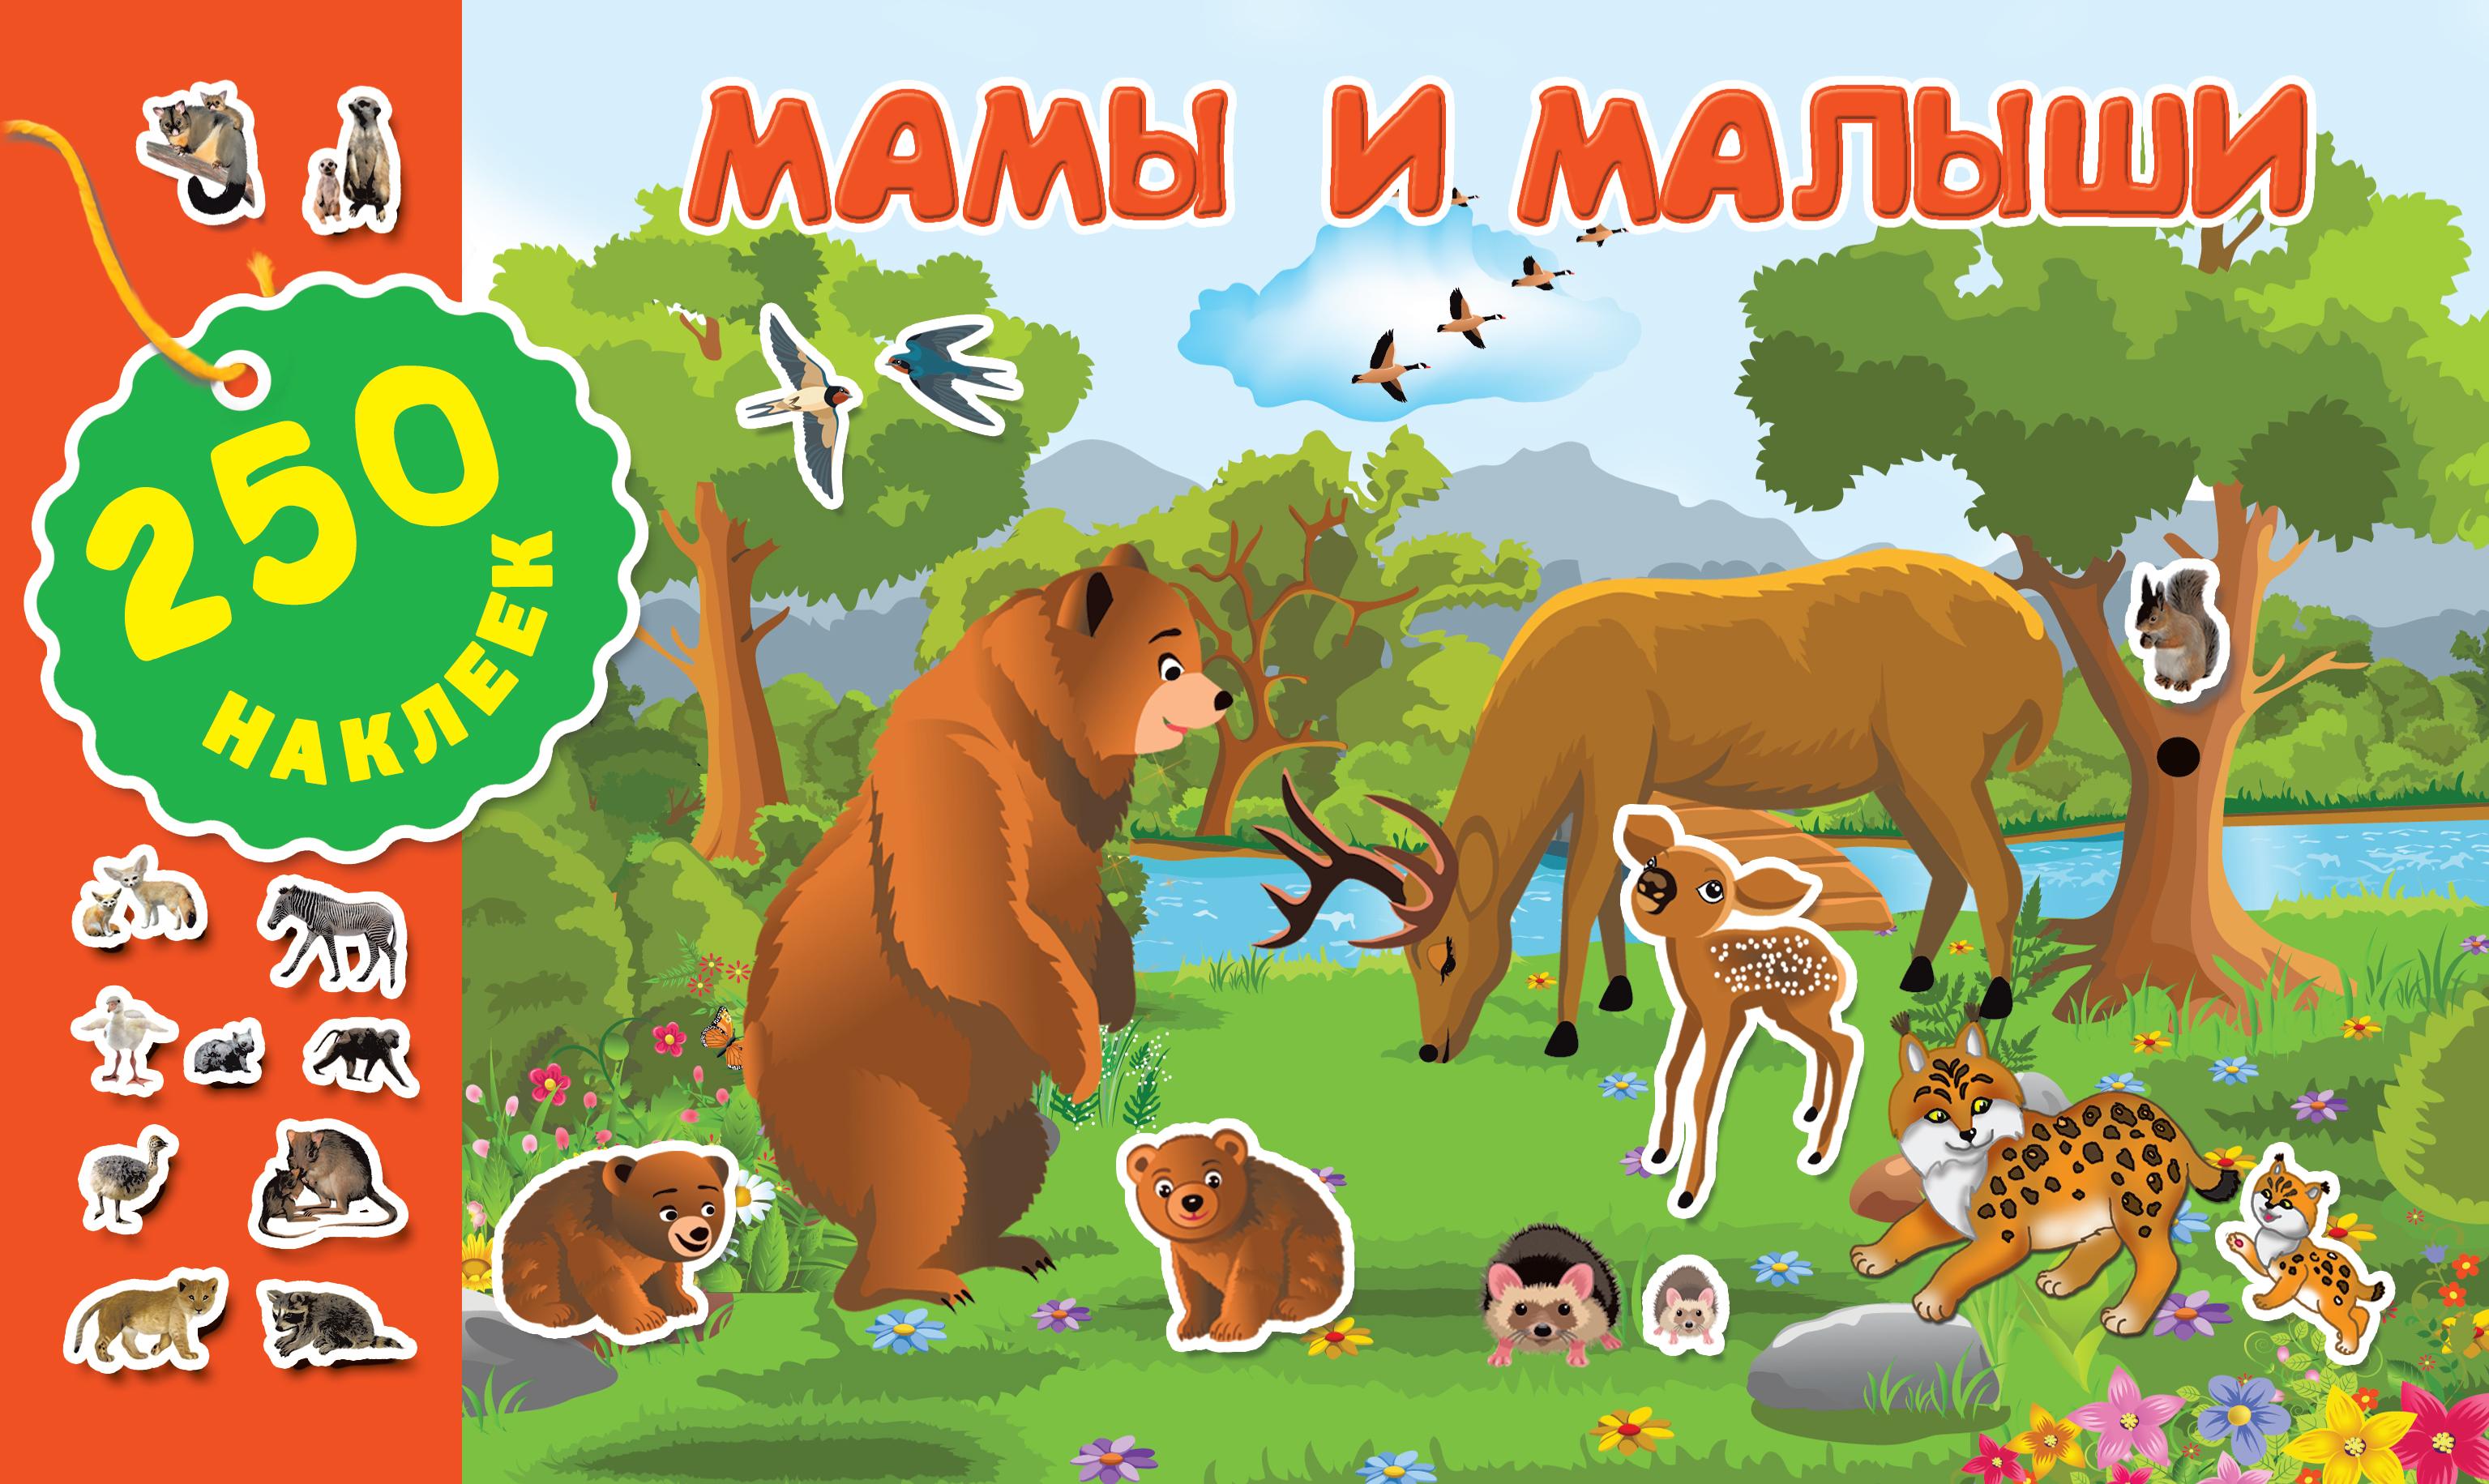 Рахманов А., Глотова В.Ю. Мамы и малыши глотова в рахманов а илл в мире животных 500 наклеек